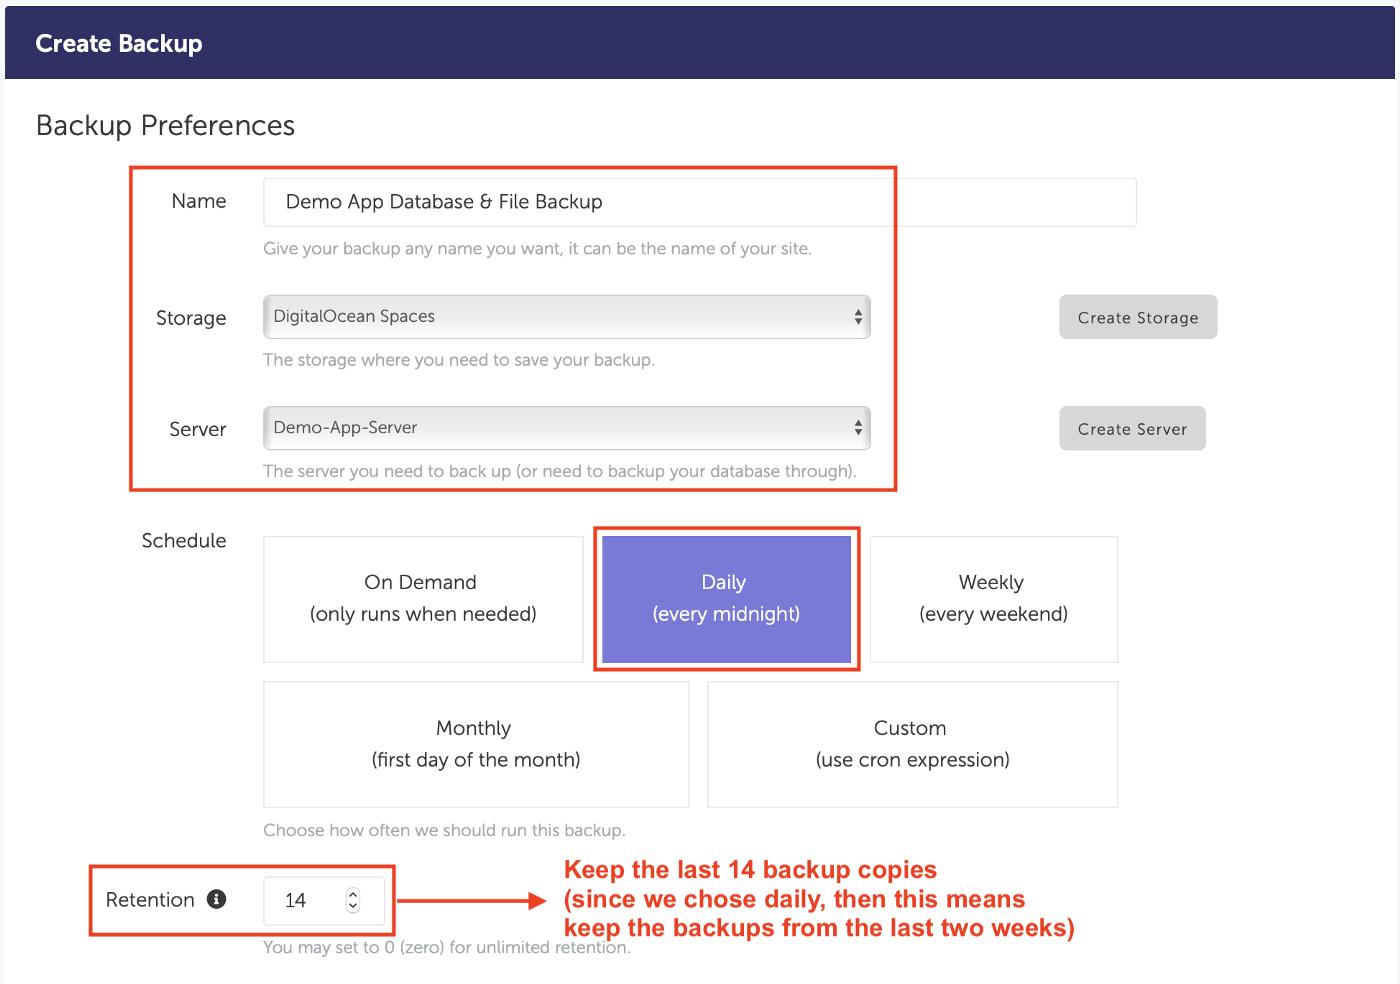 SimpleBackups - Create Backup